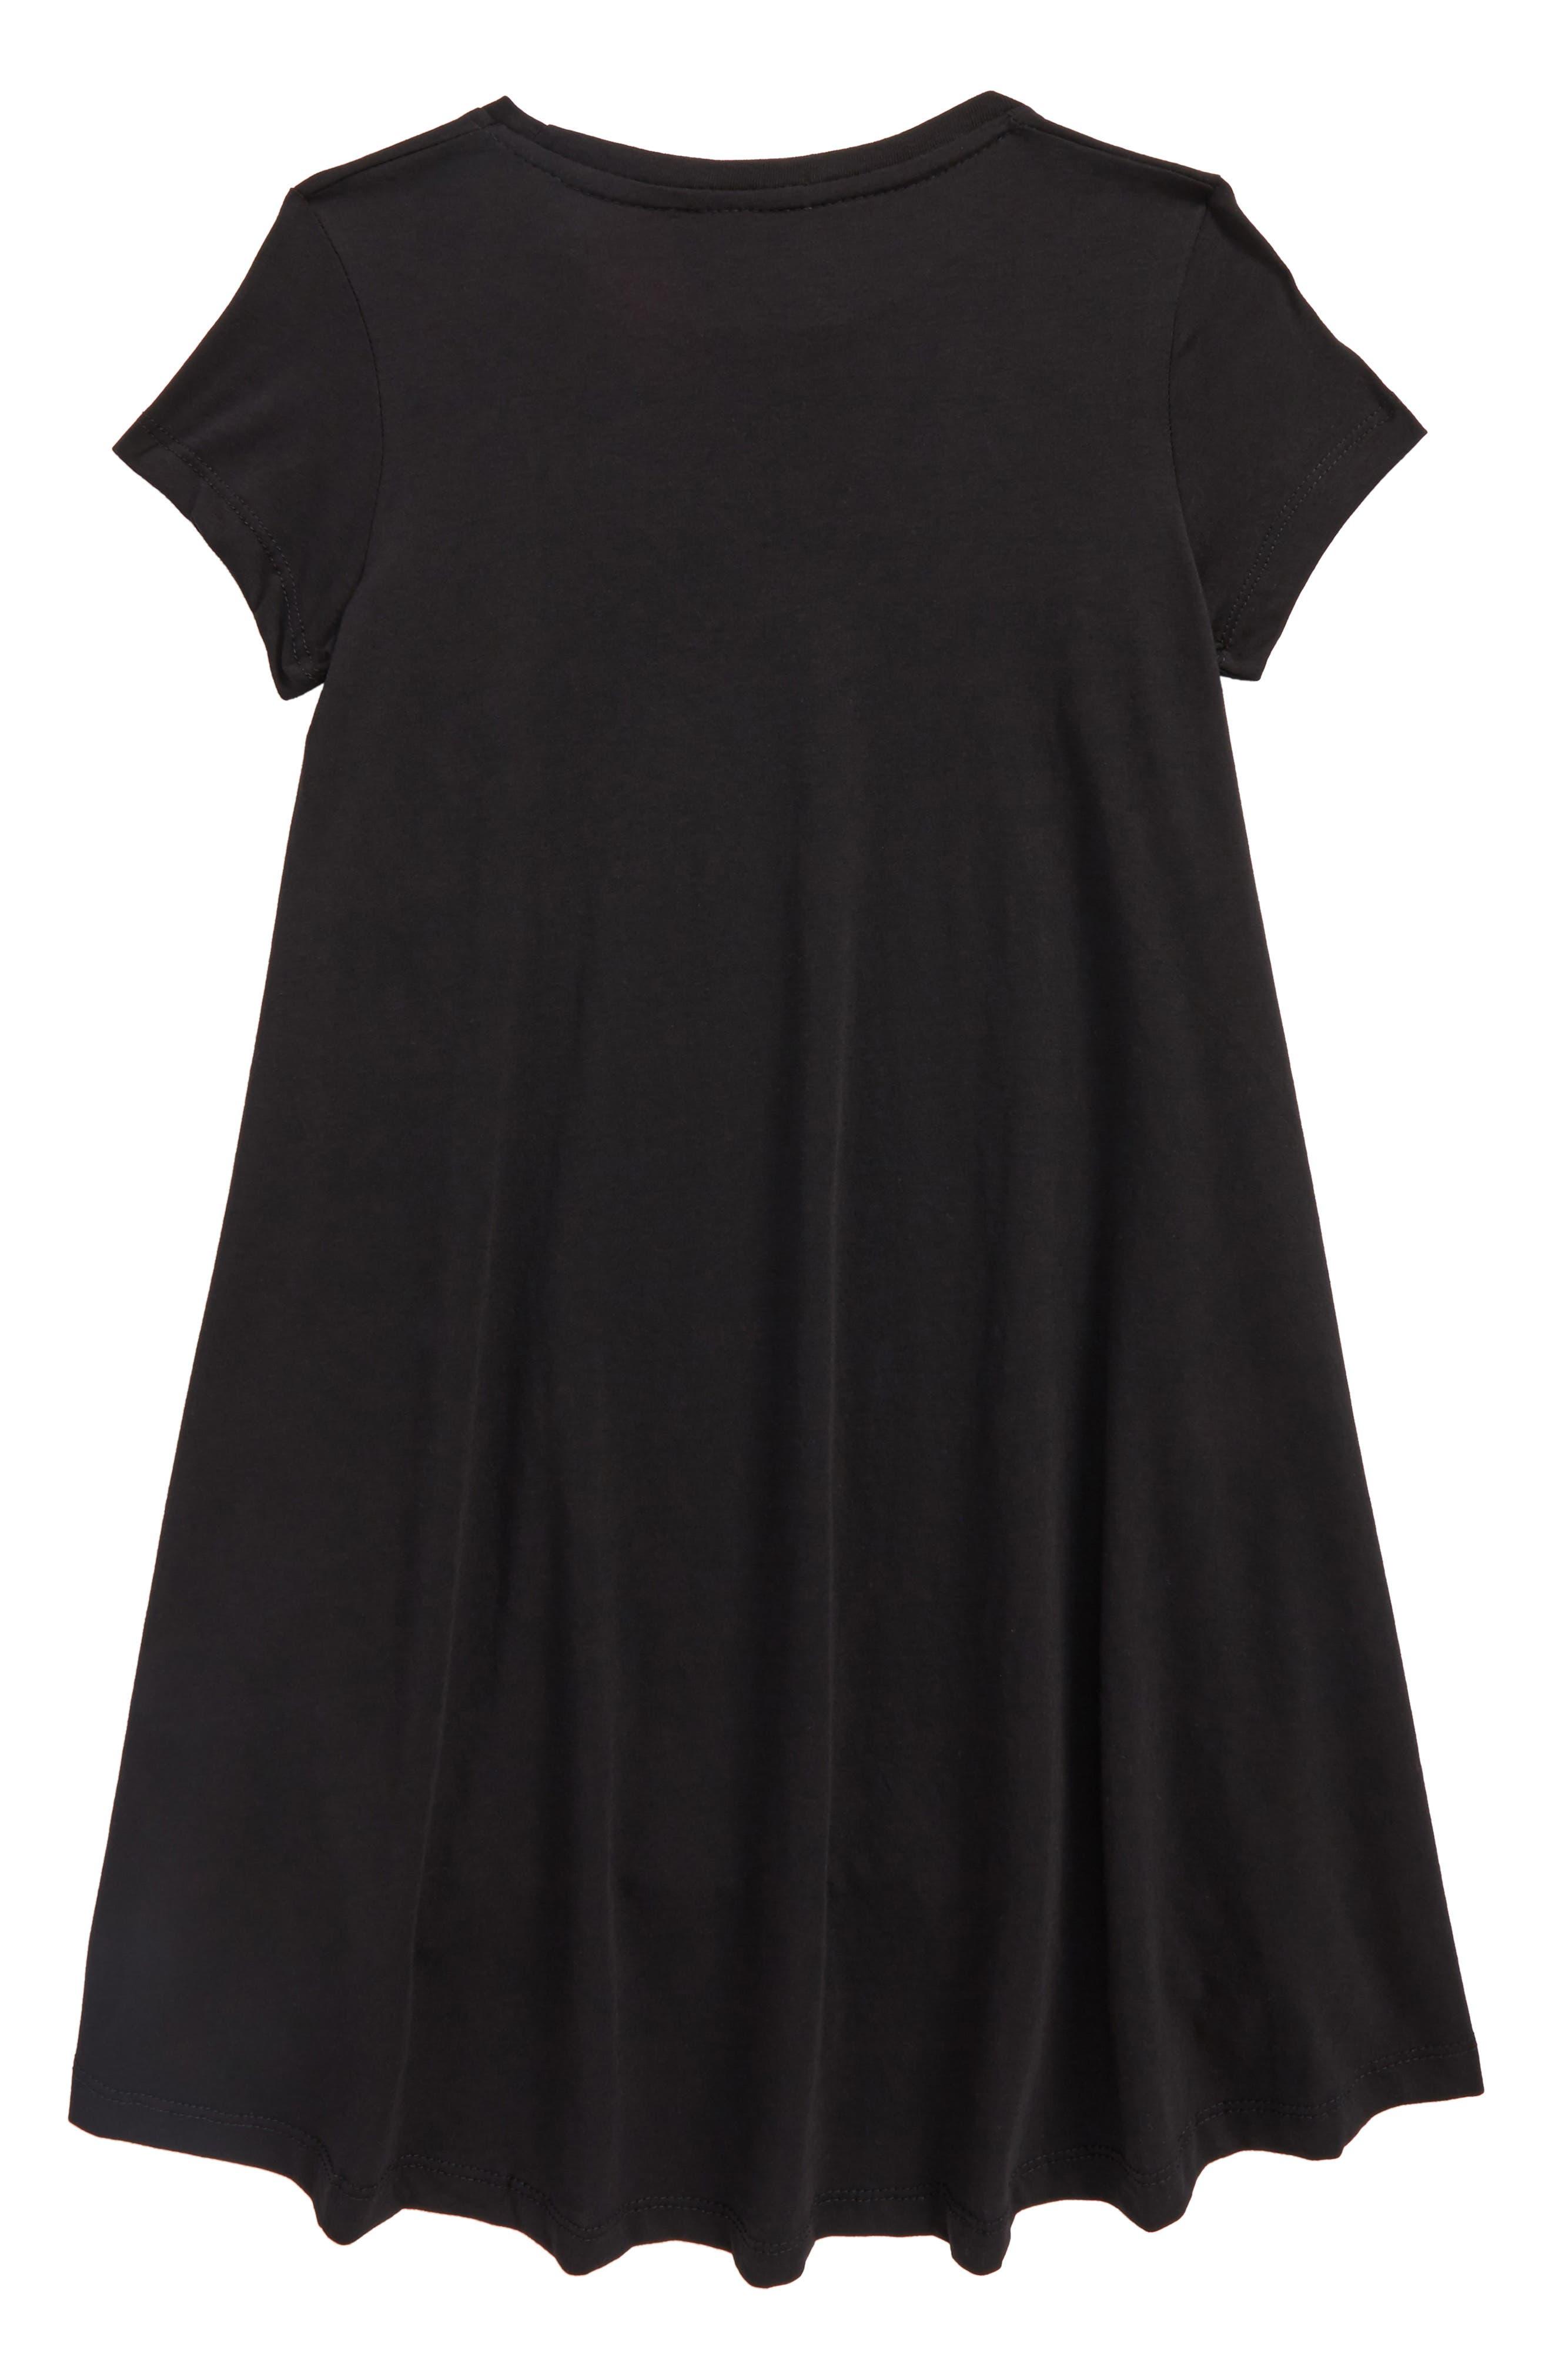 Dark Side of the Moon Twirl Dress,                             Alternate thumbnail 2, color,                             001